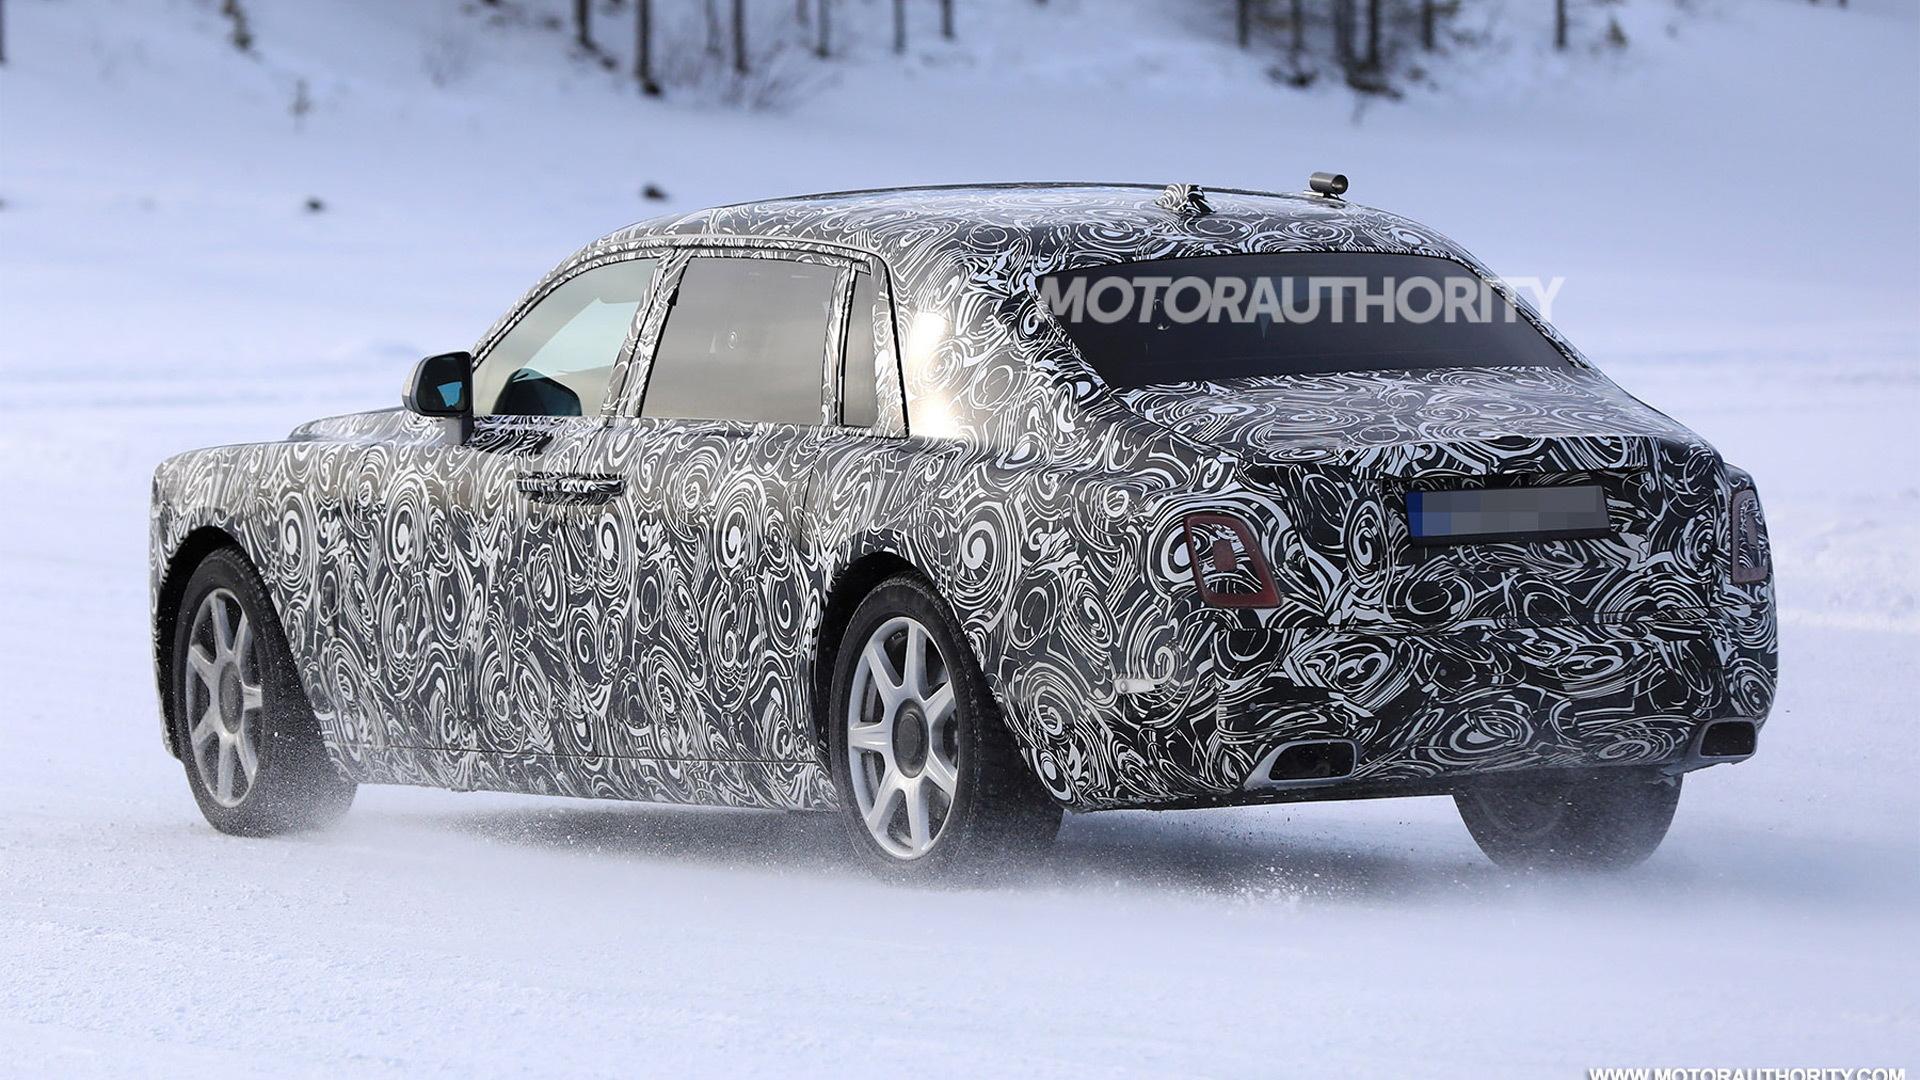 2018 Rolls-Royce Phantom spy shots - Image via S. Baldauf/SB-Medien